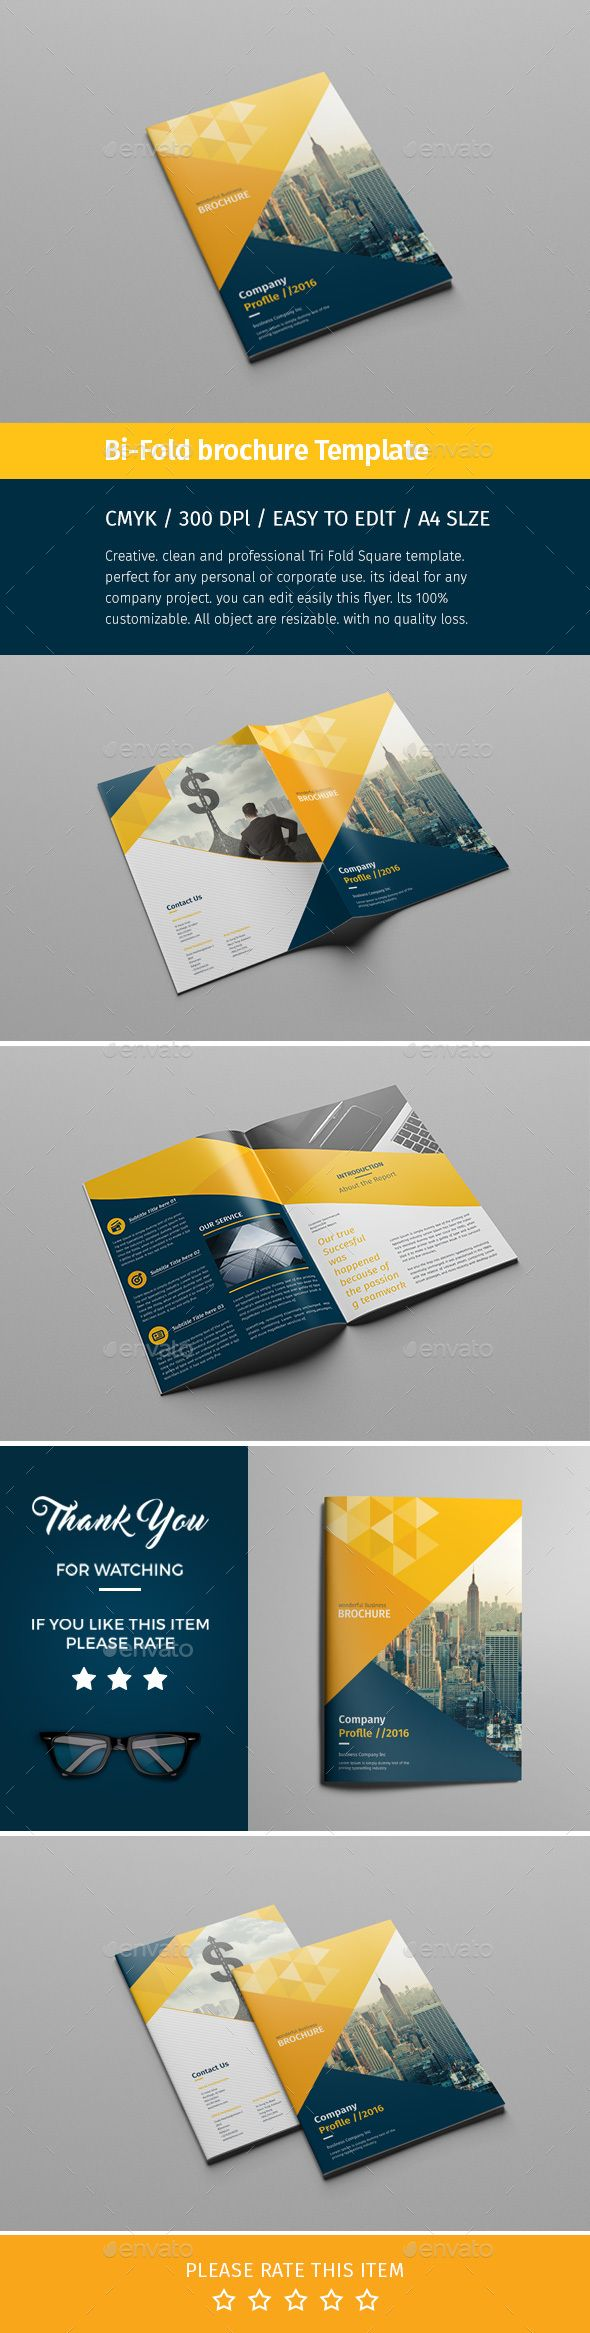 Corporate Bi-fold Brochure Template PSD. Download here: https://graphicriver.net/item/corporate-bifold-brochuremultipurpose-01/17265775?ref=ksioks